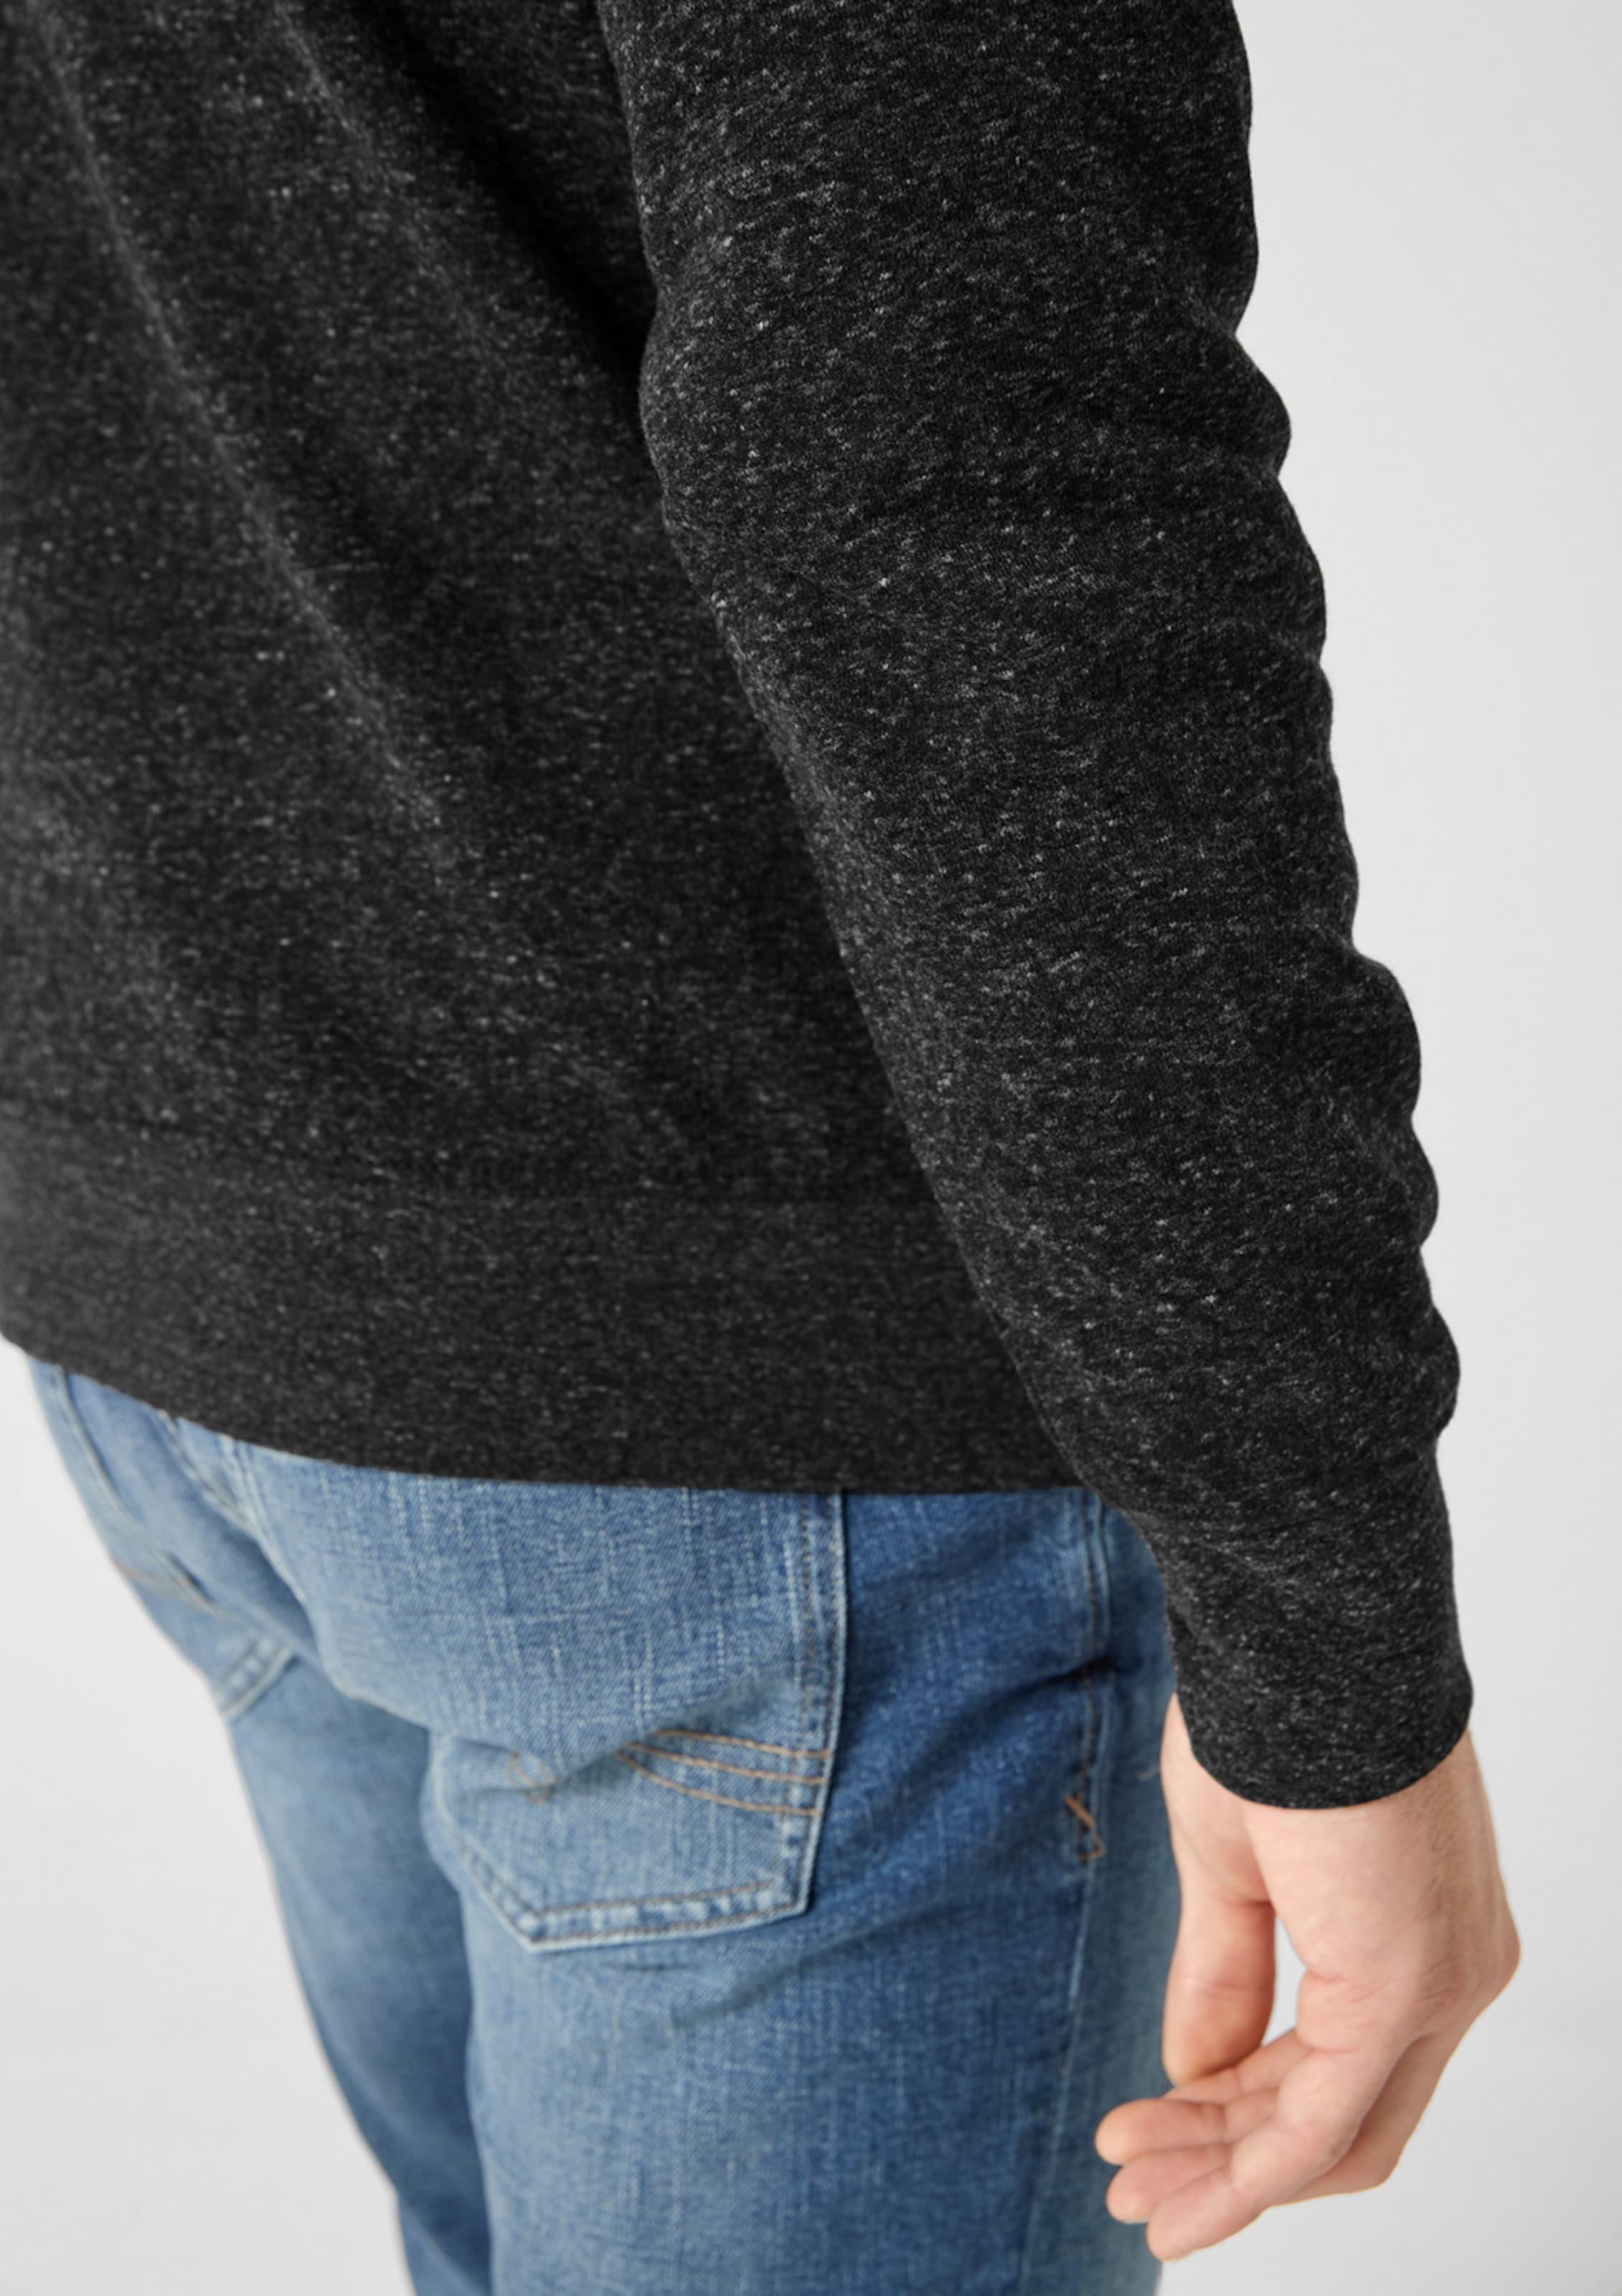 S Schwarzmeliert S oliver Sweatshirt In mOv8n0wN